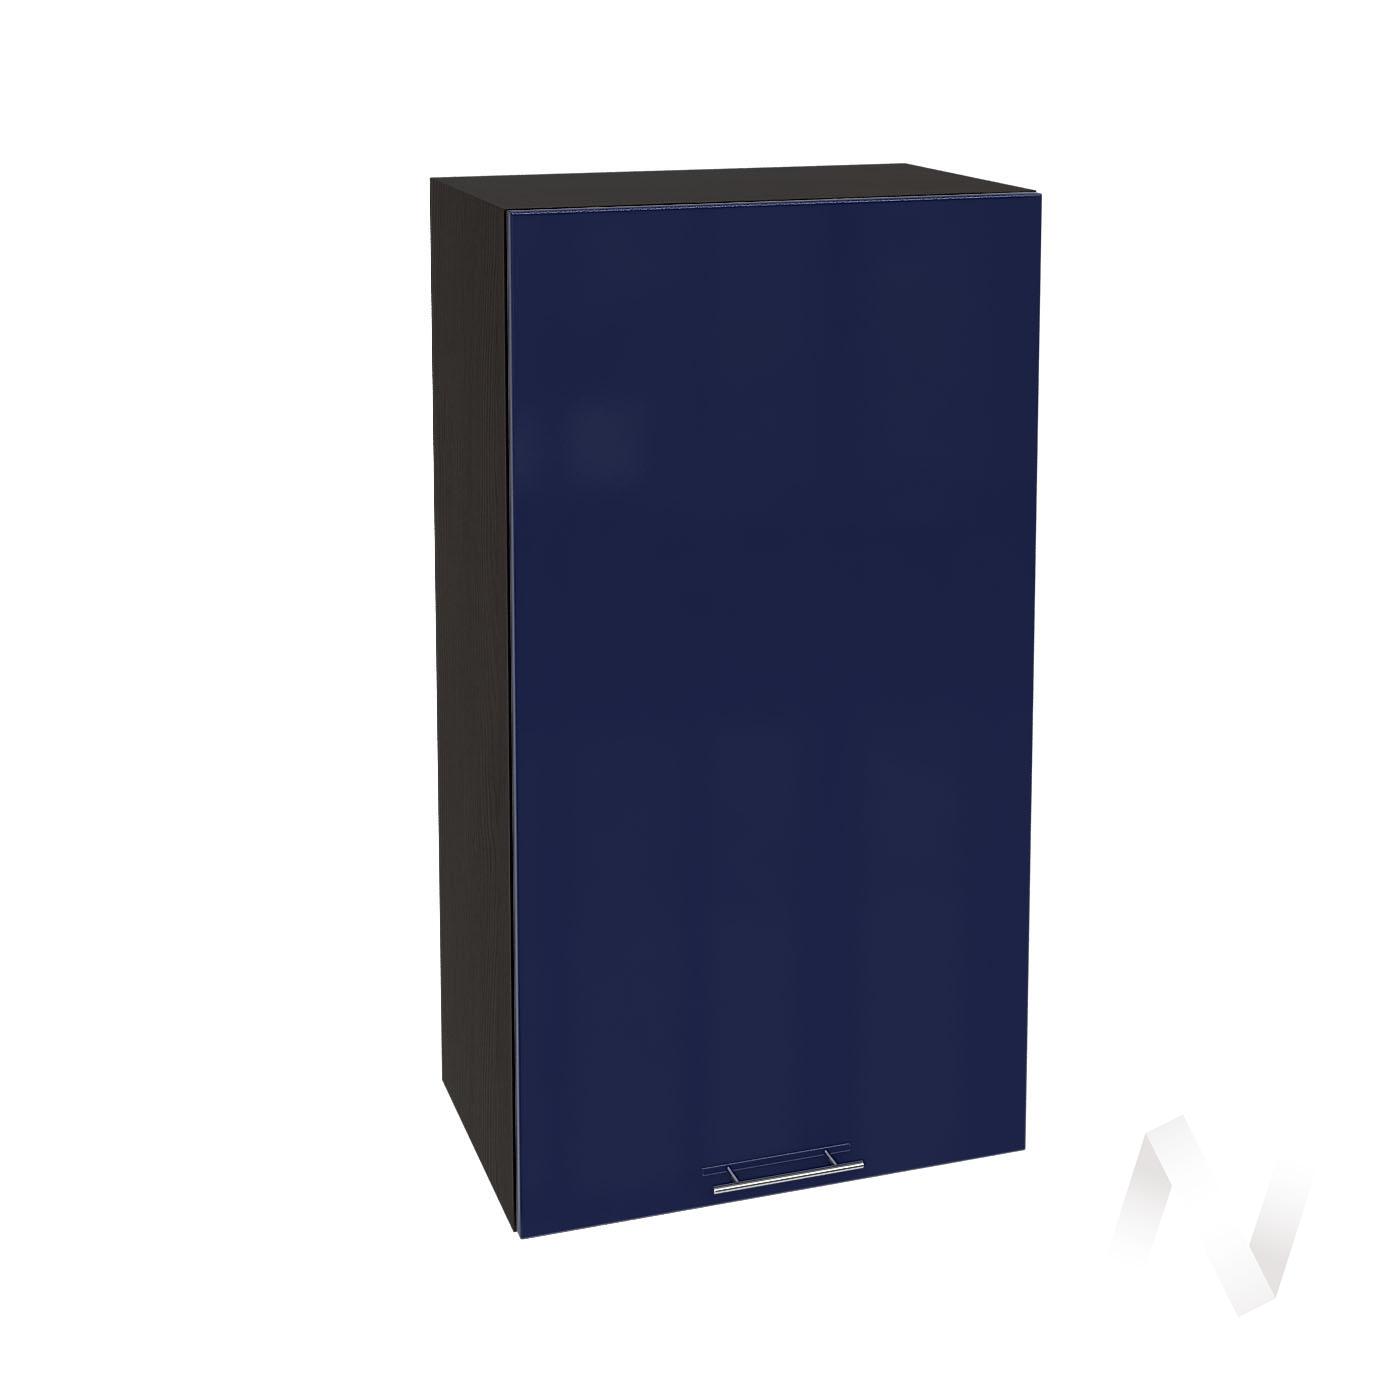 "Кухня ""Валерия-М"": Шкаф верхний 509, ШВ 509 (Синий глянец/корпус венге)"